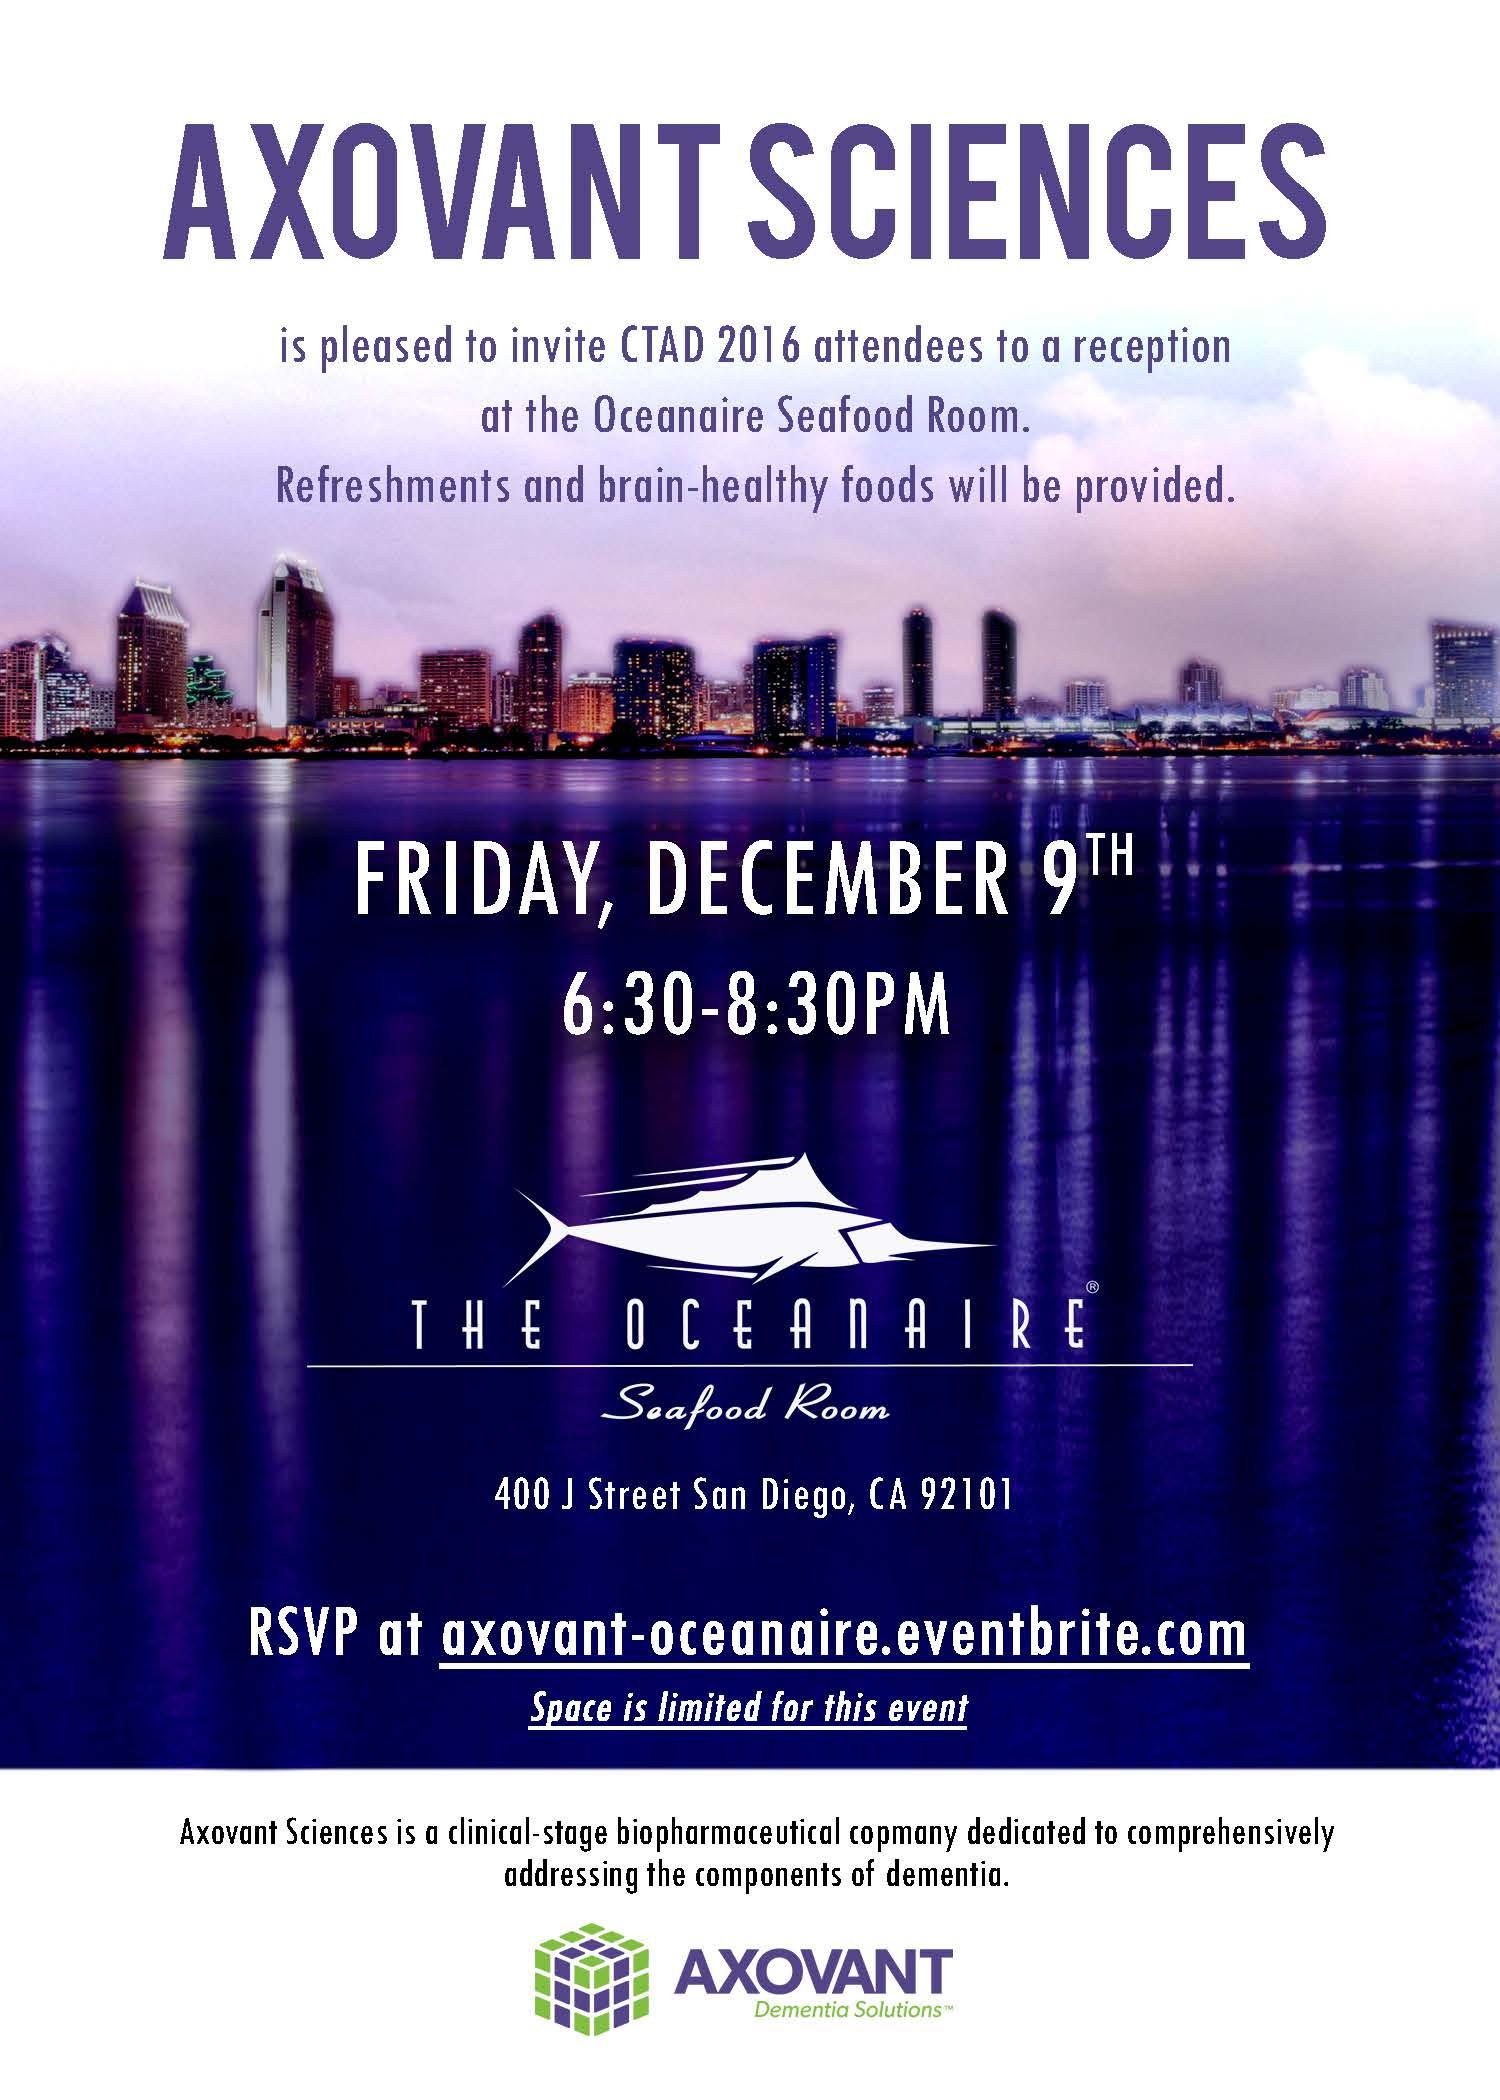 Axovant reception invitation